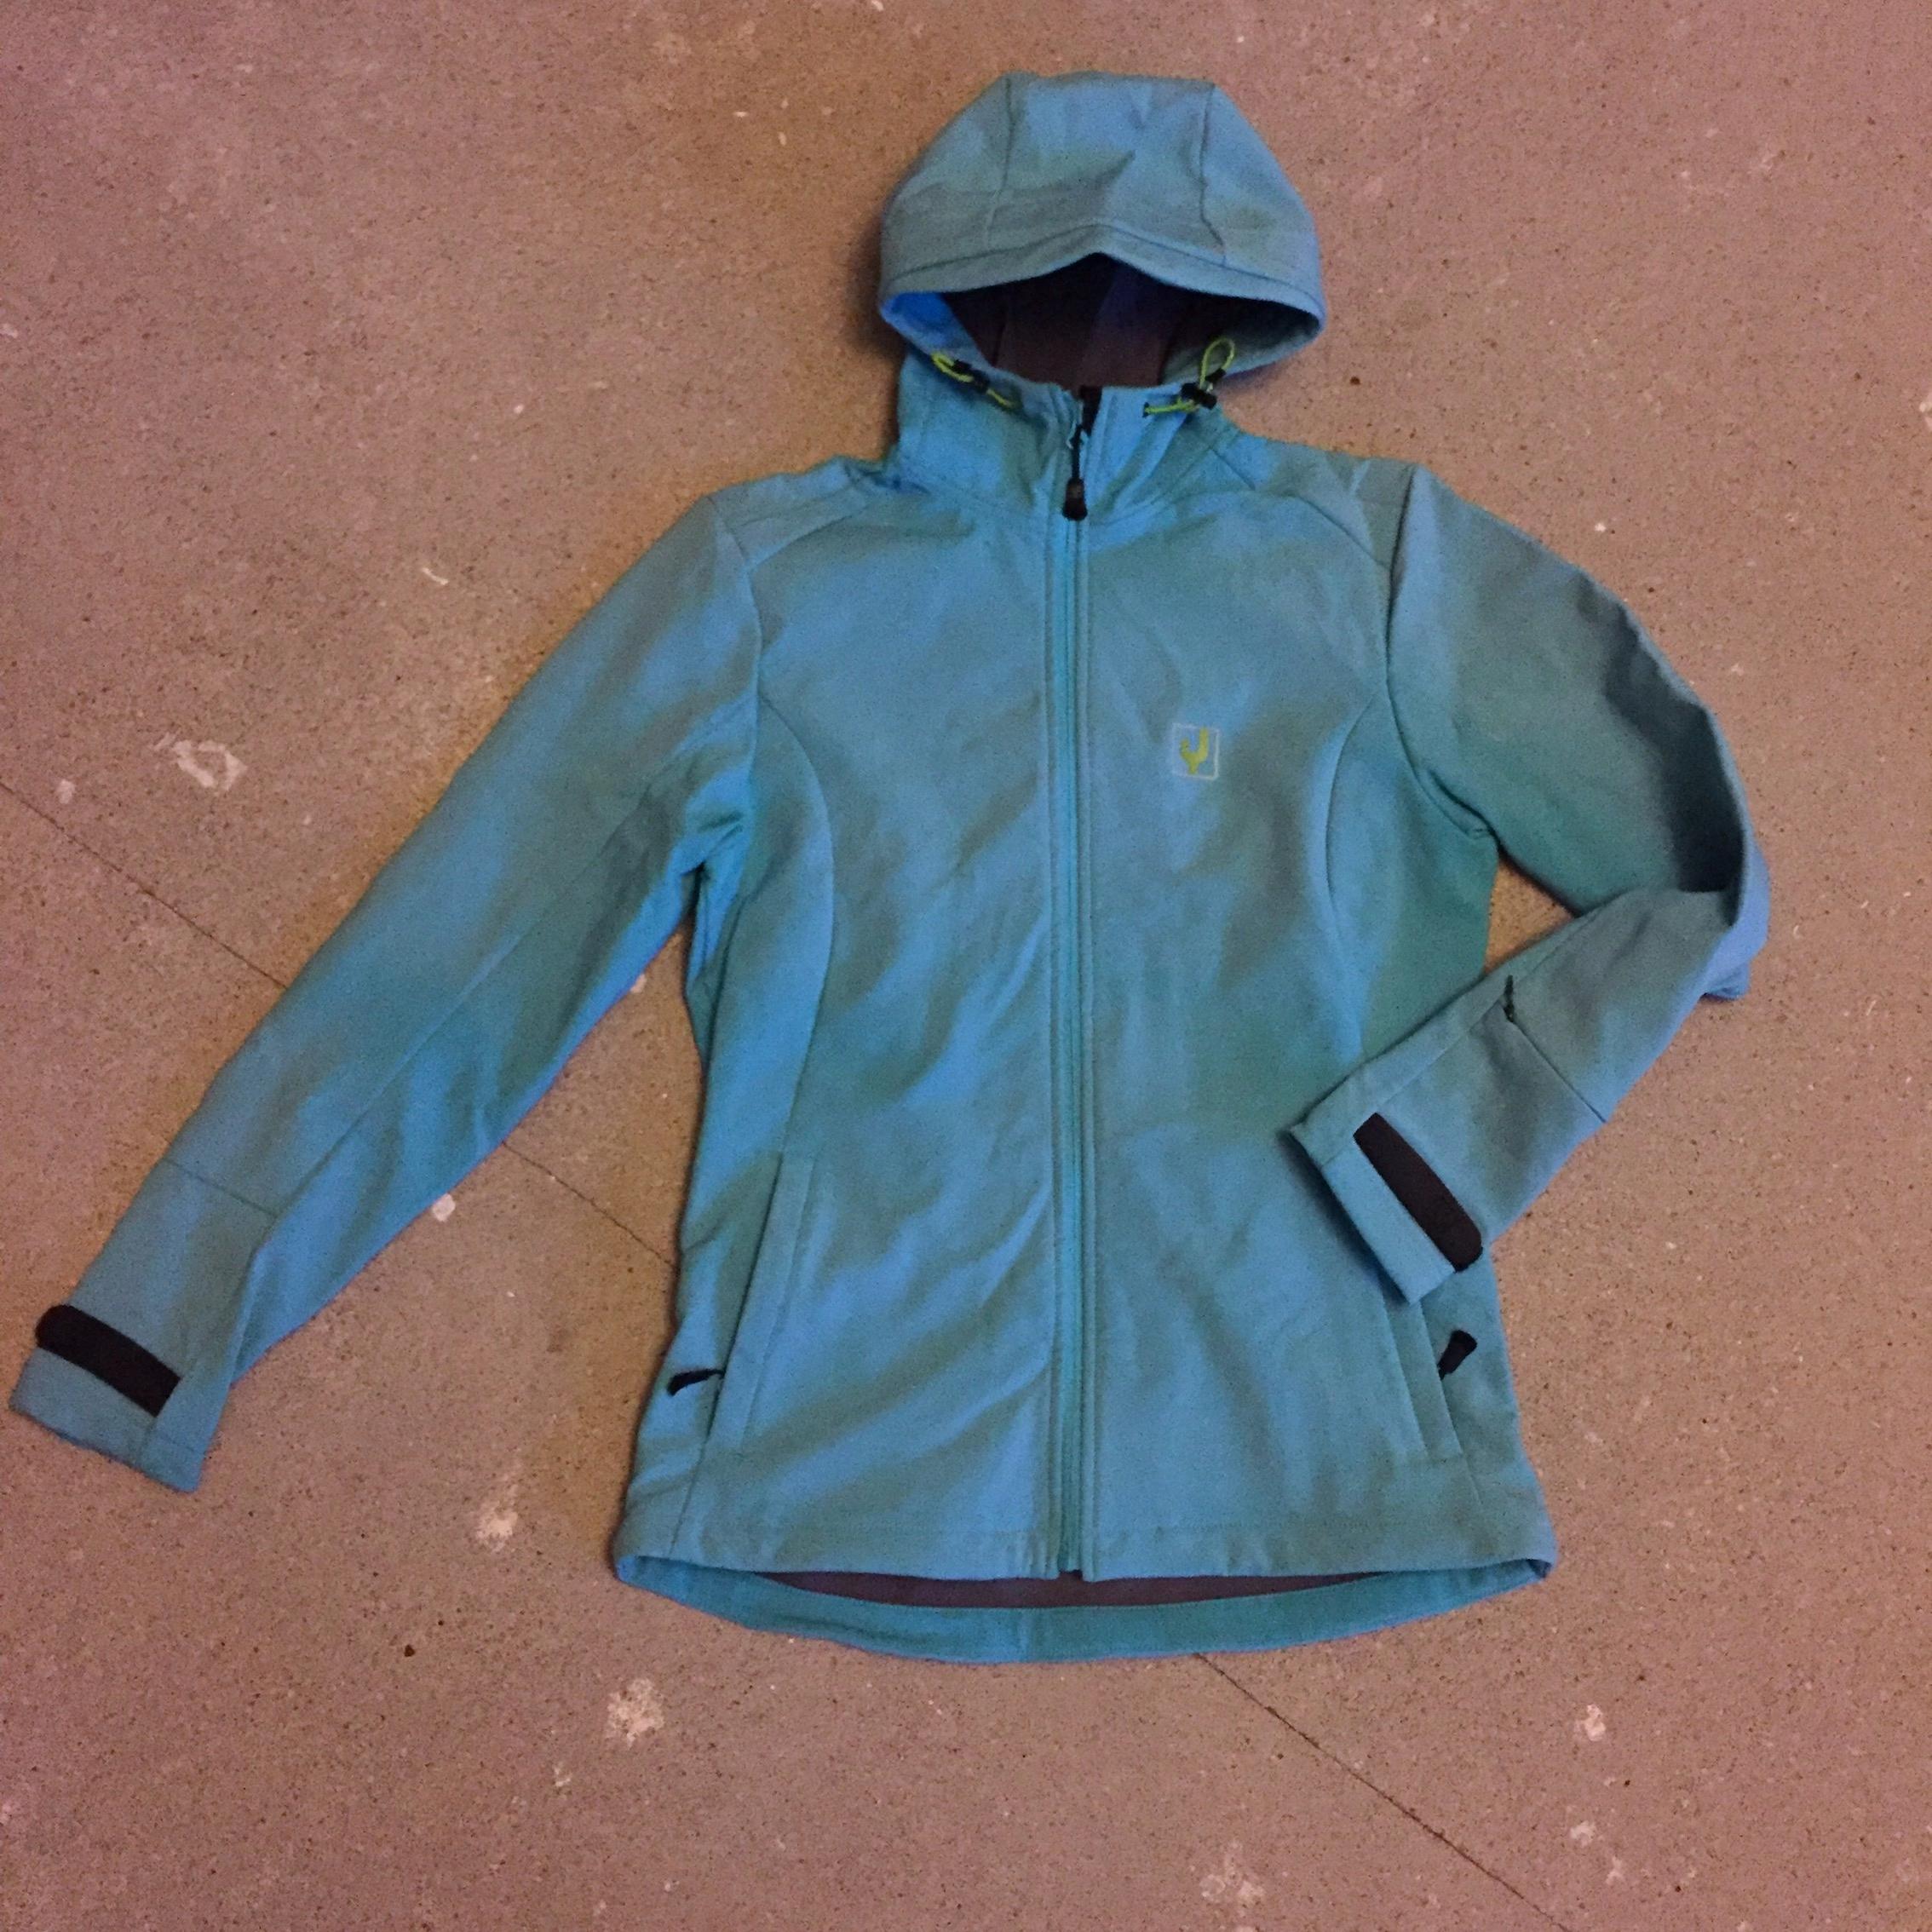 2a8830457b266 Softshell Ayacucho turkusowy na polarze okazja cud - 7719633710 ...